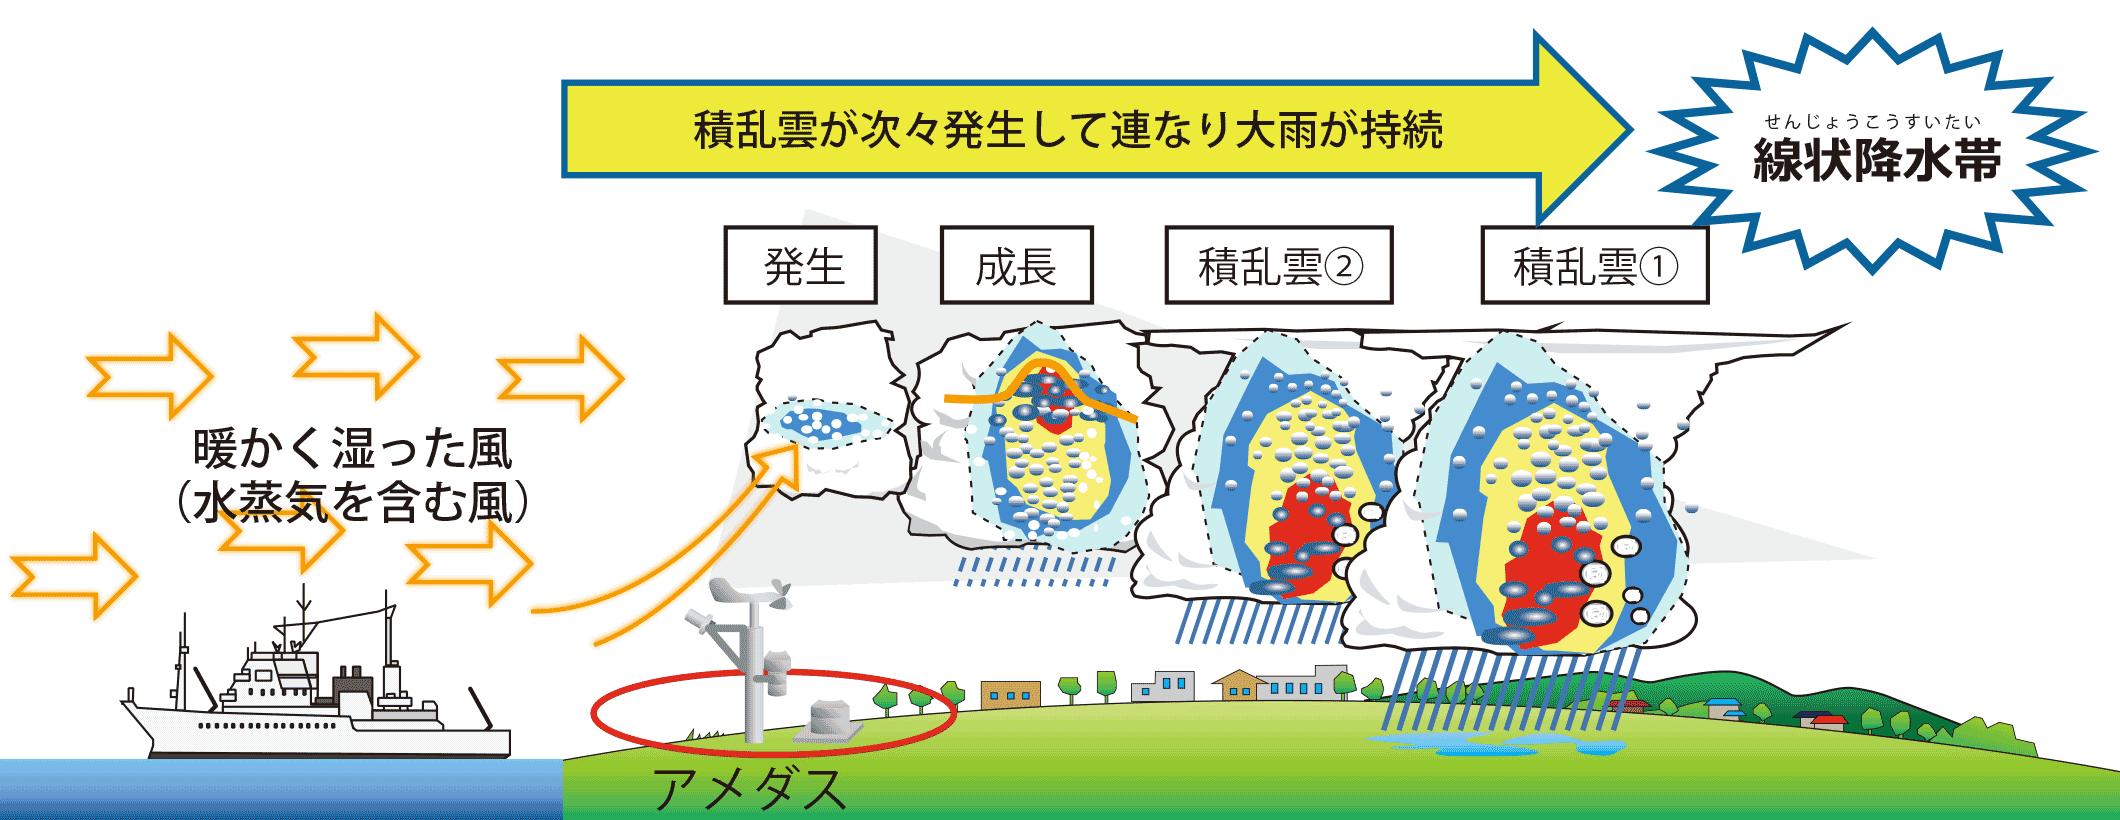 JMA-19型アメダス気象計イメージ図